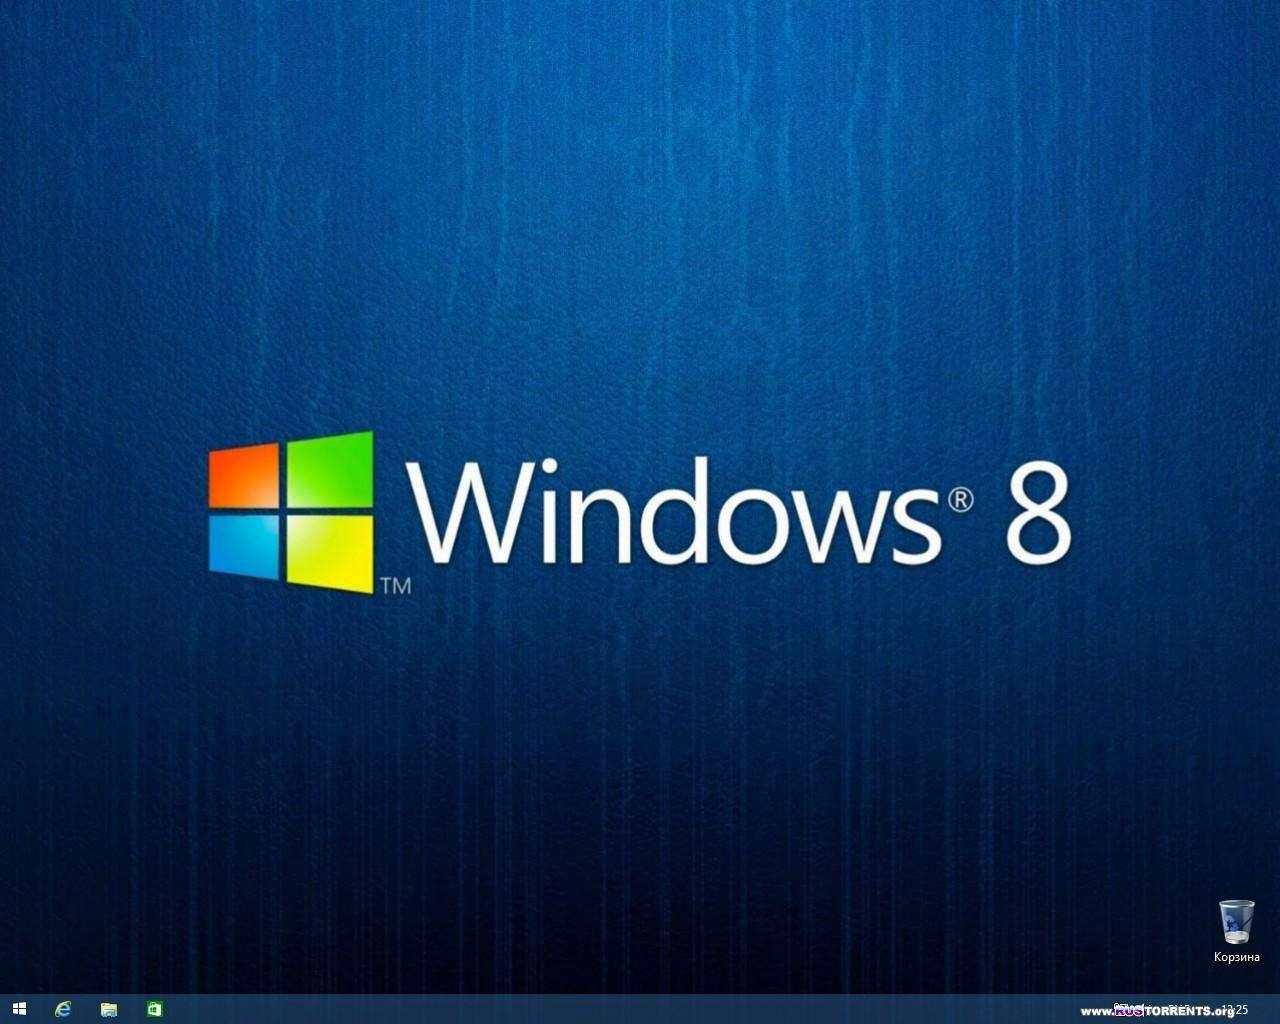 Windows 8.1 Professional x86/x64 2in1 AERO by EmiN 21.09.2014 RUS